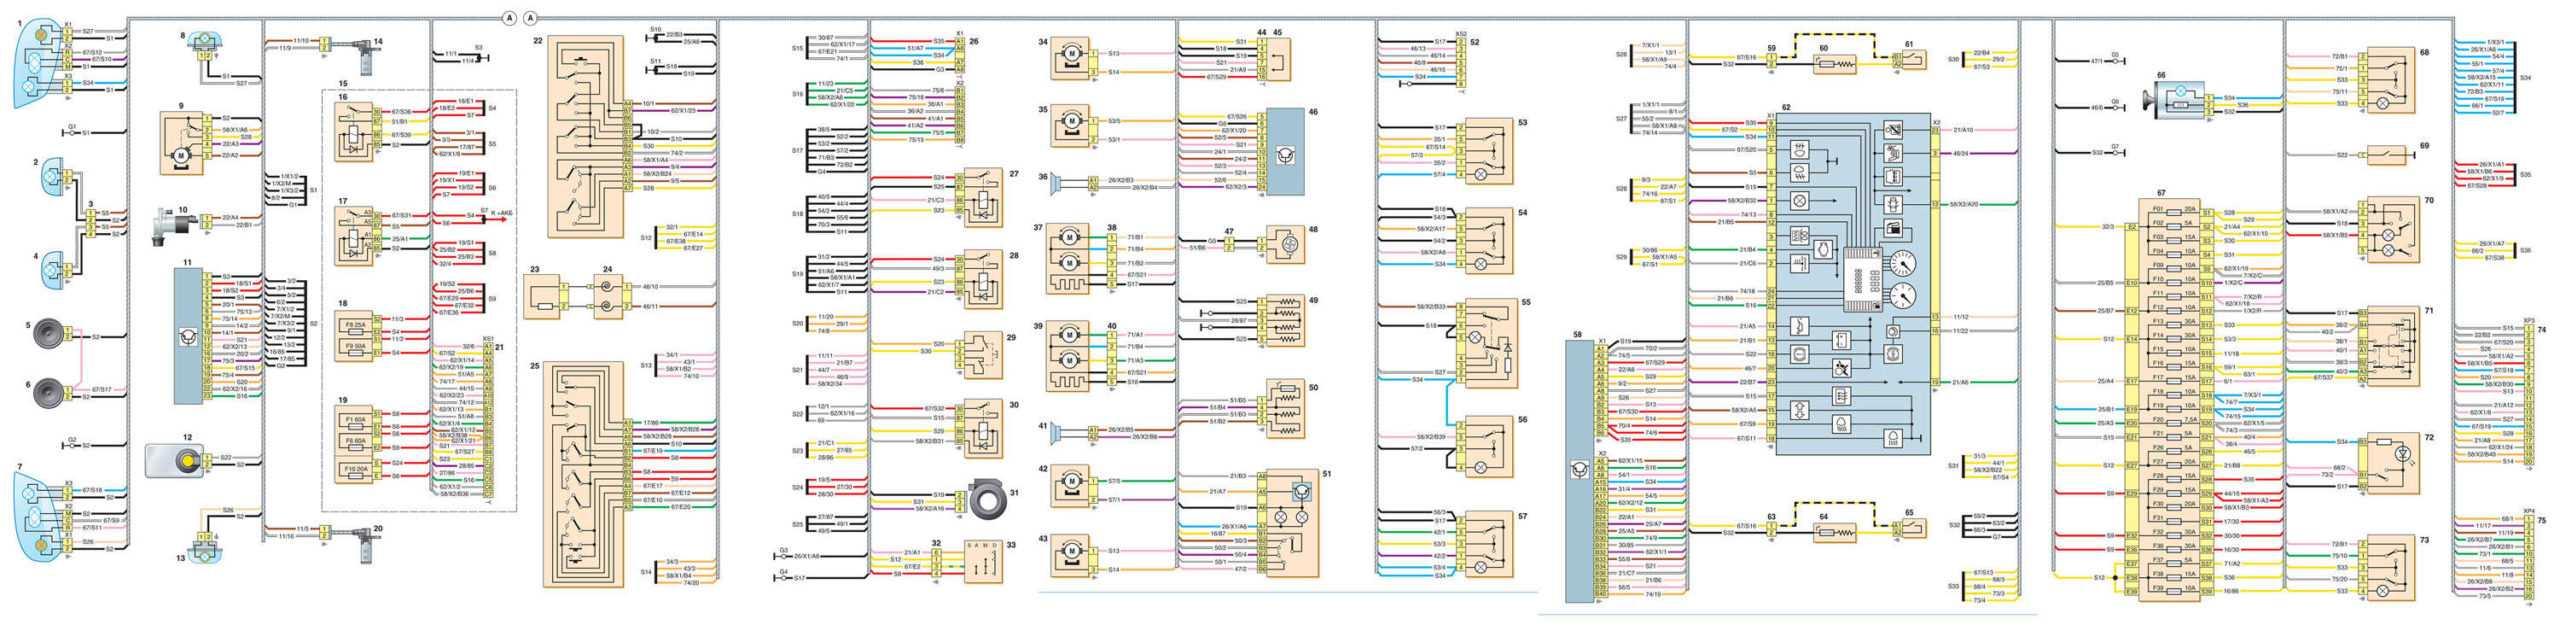 Nissan Almera Classic с 2006 года, применение схем инструкция онлайн